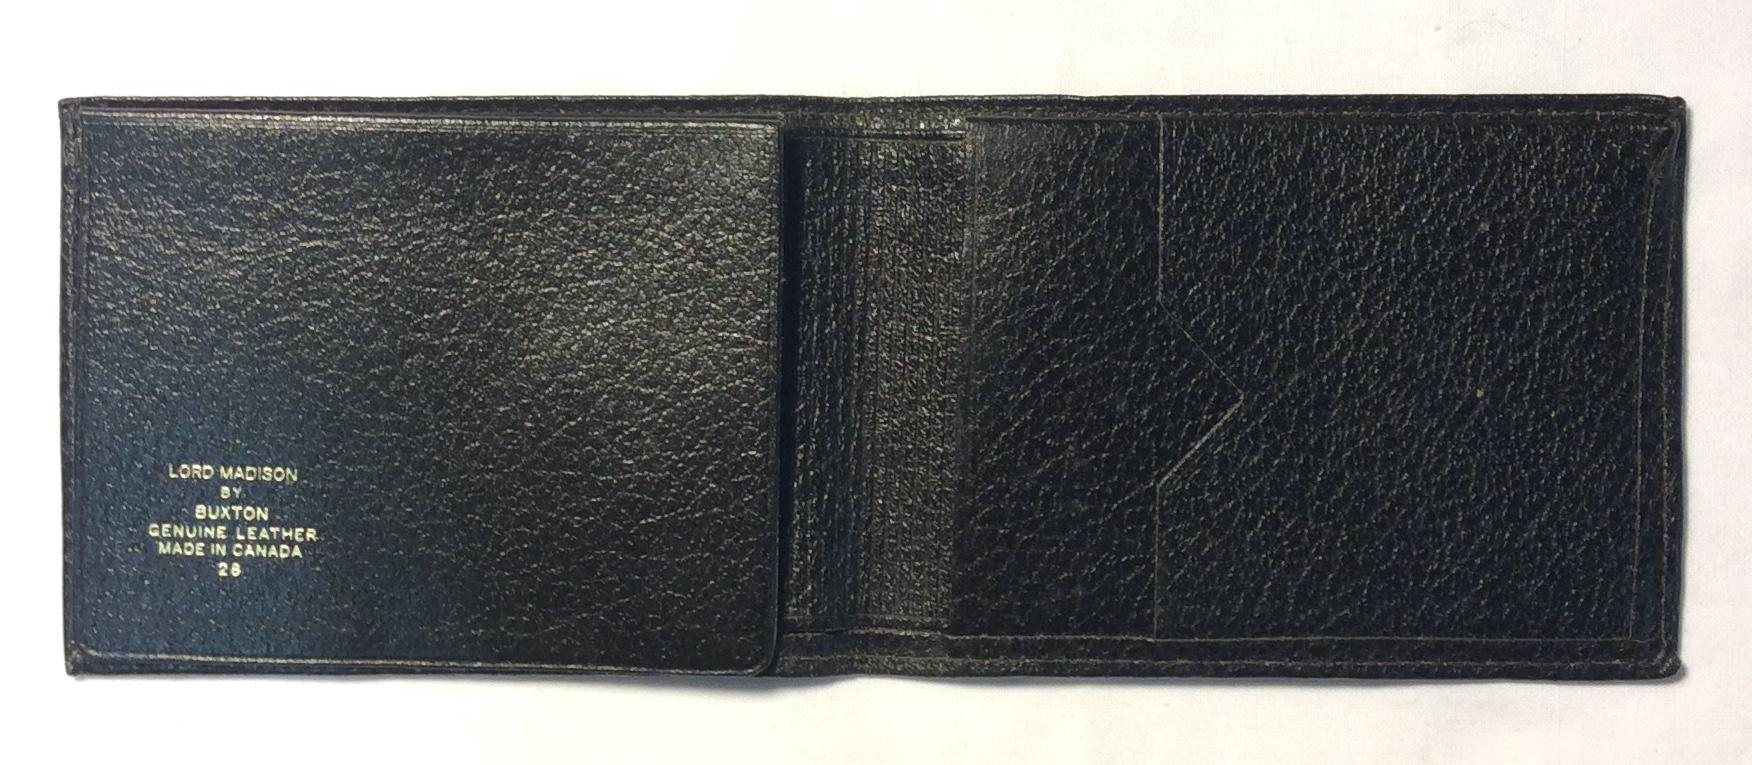 Buxton Worn charcoal leather